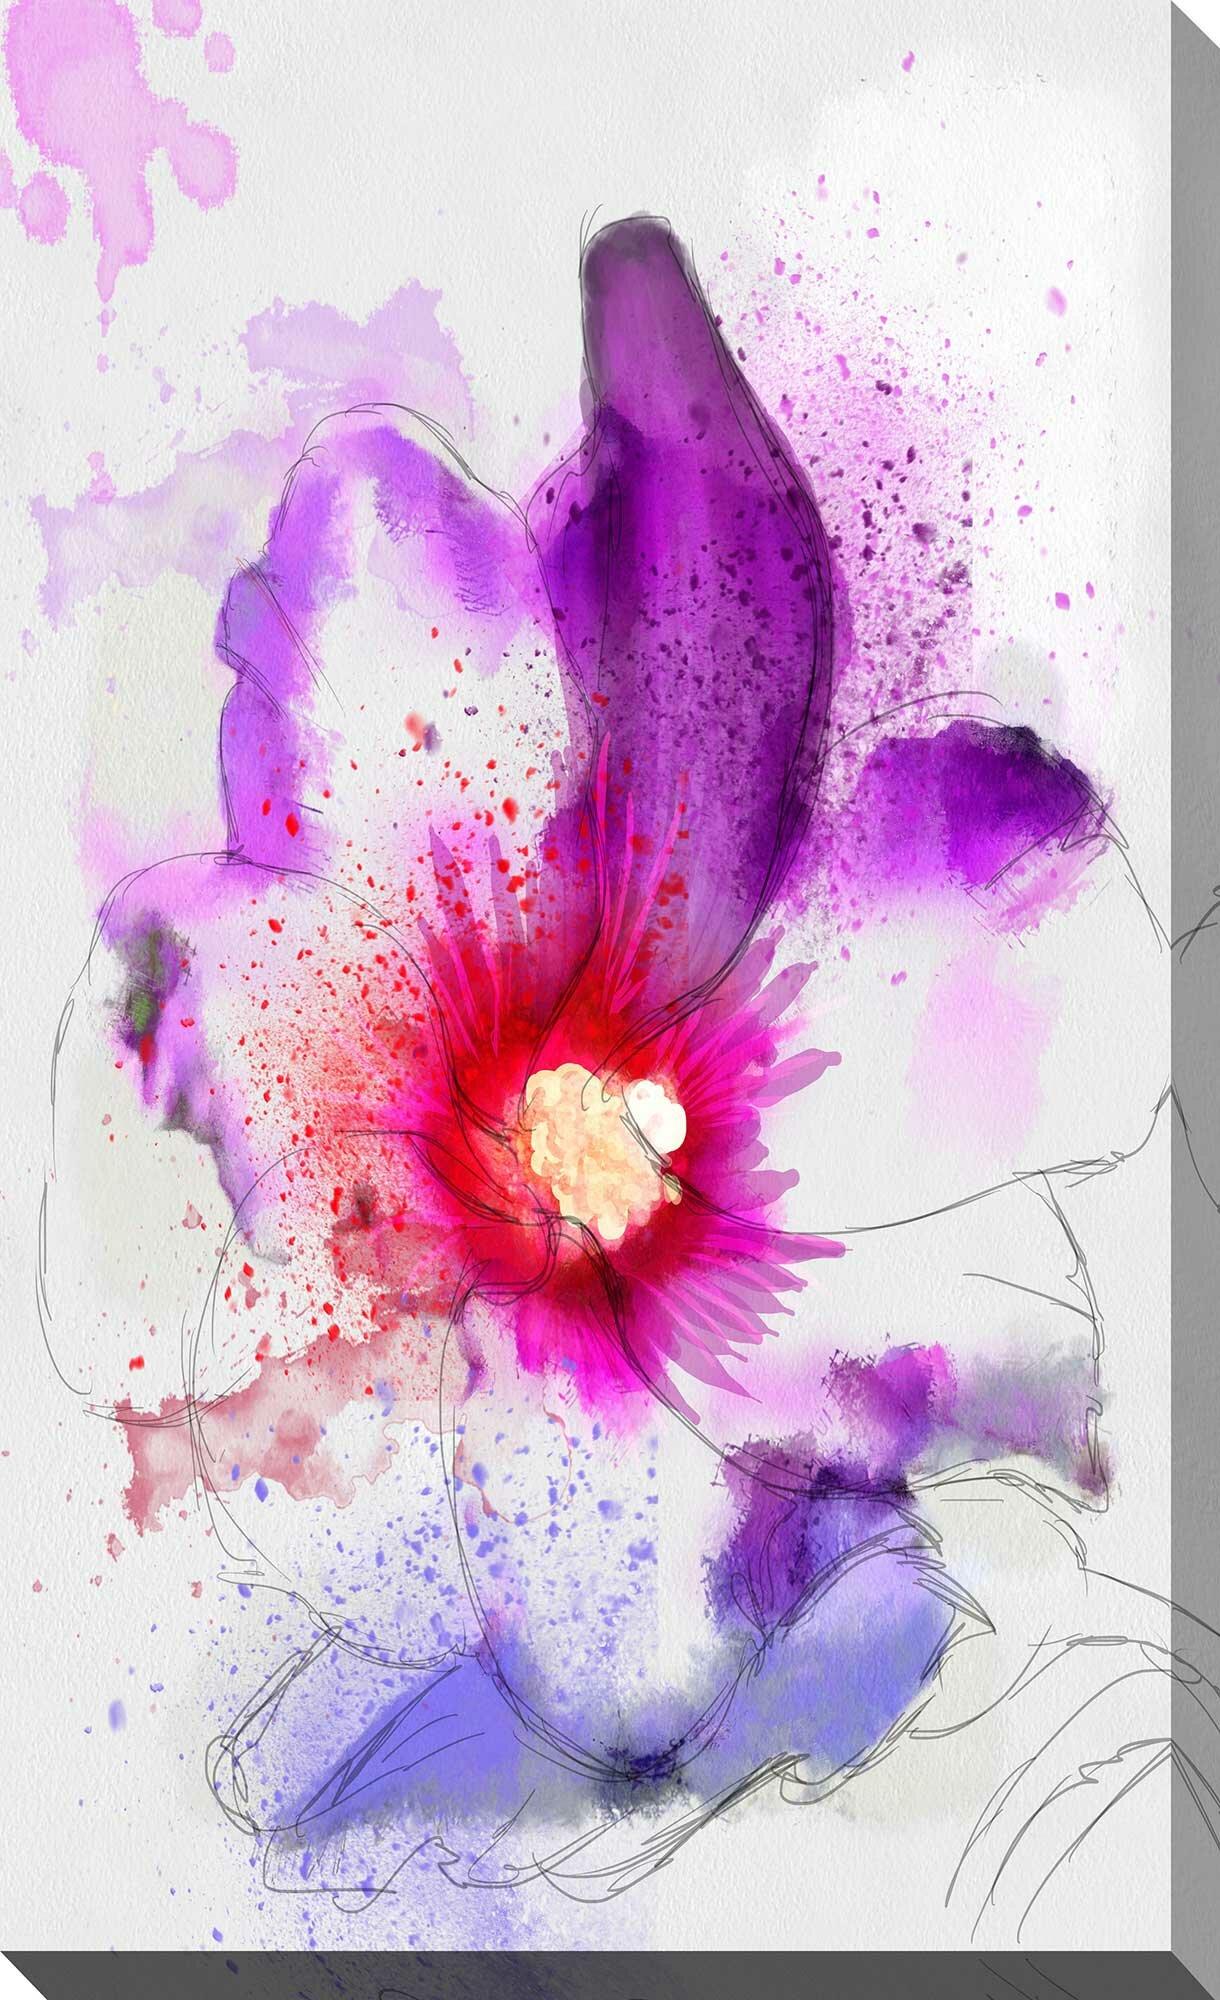 Ebern Designs Splashes V Watercolor Painting Print On